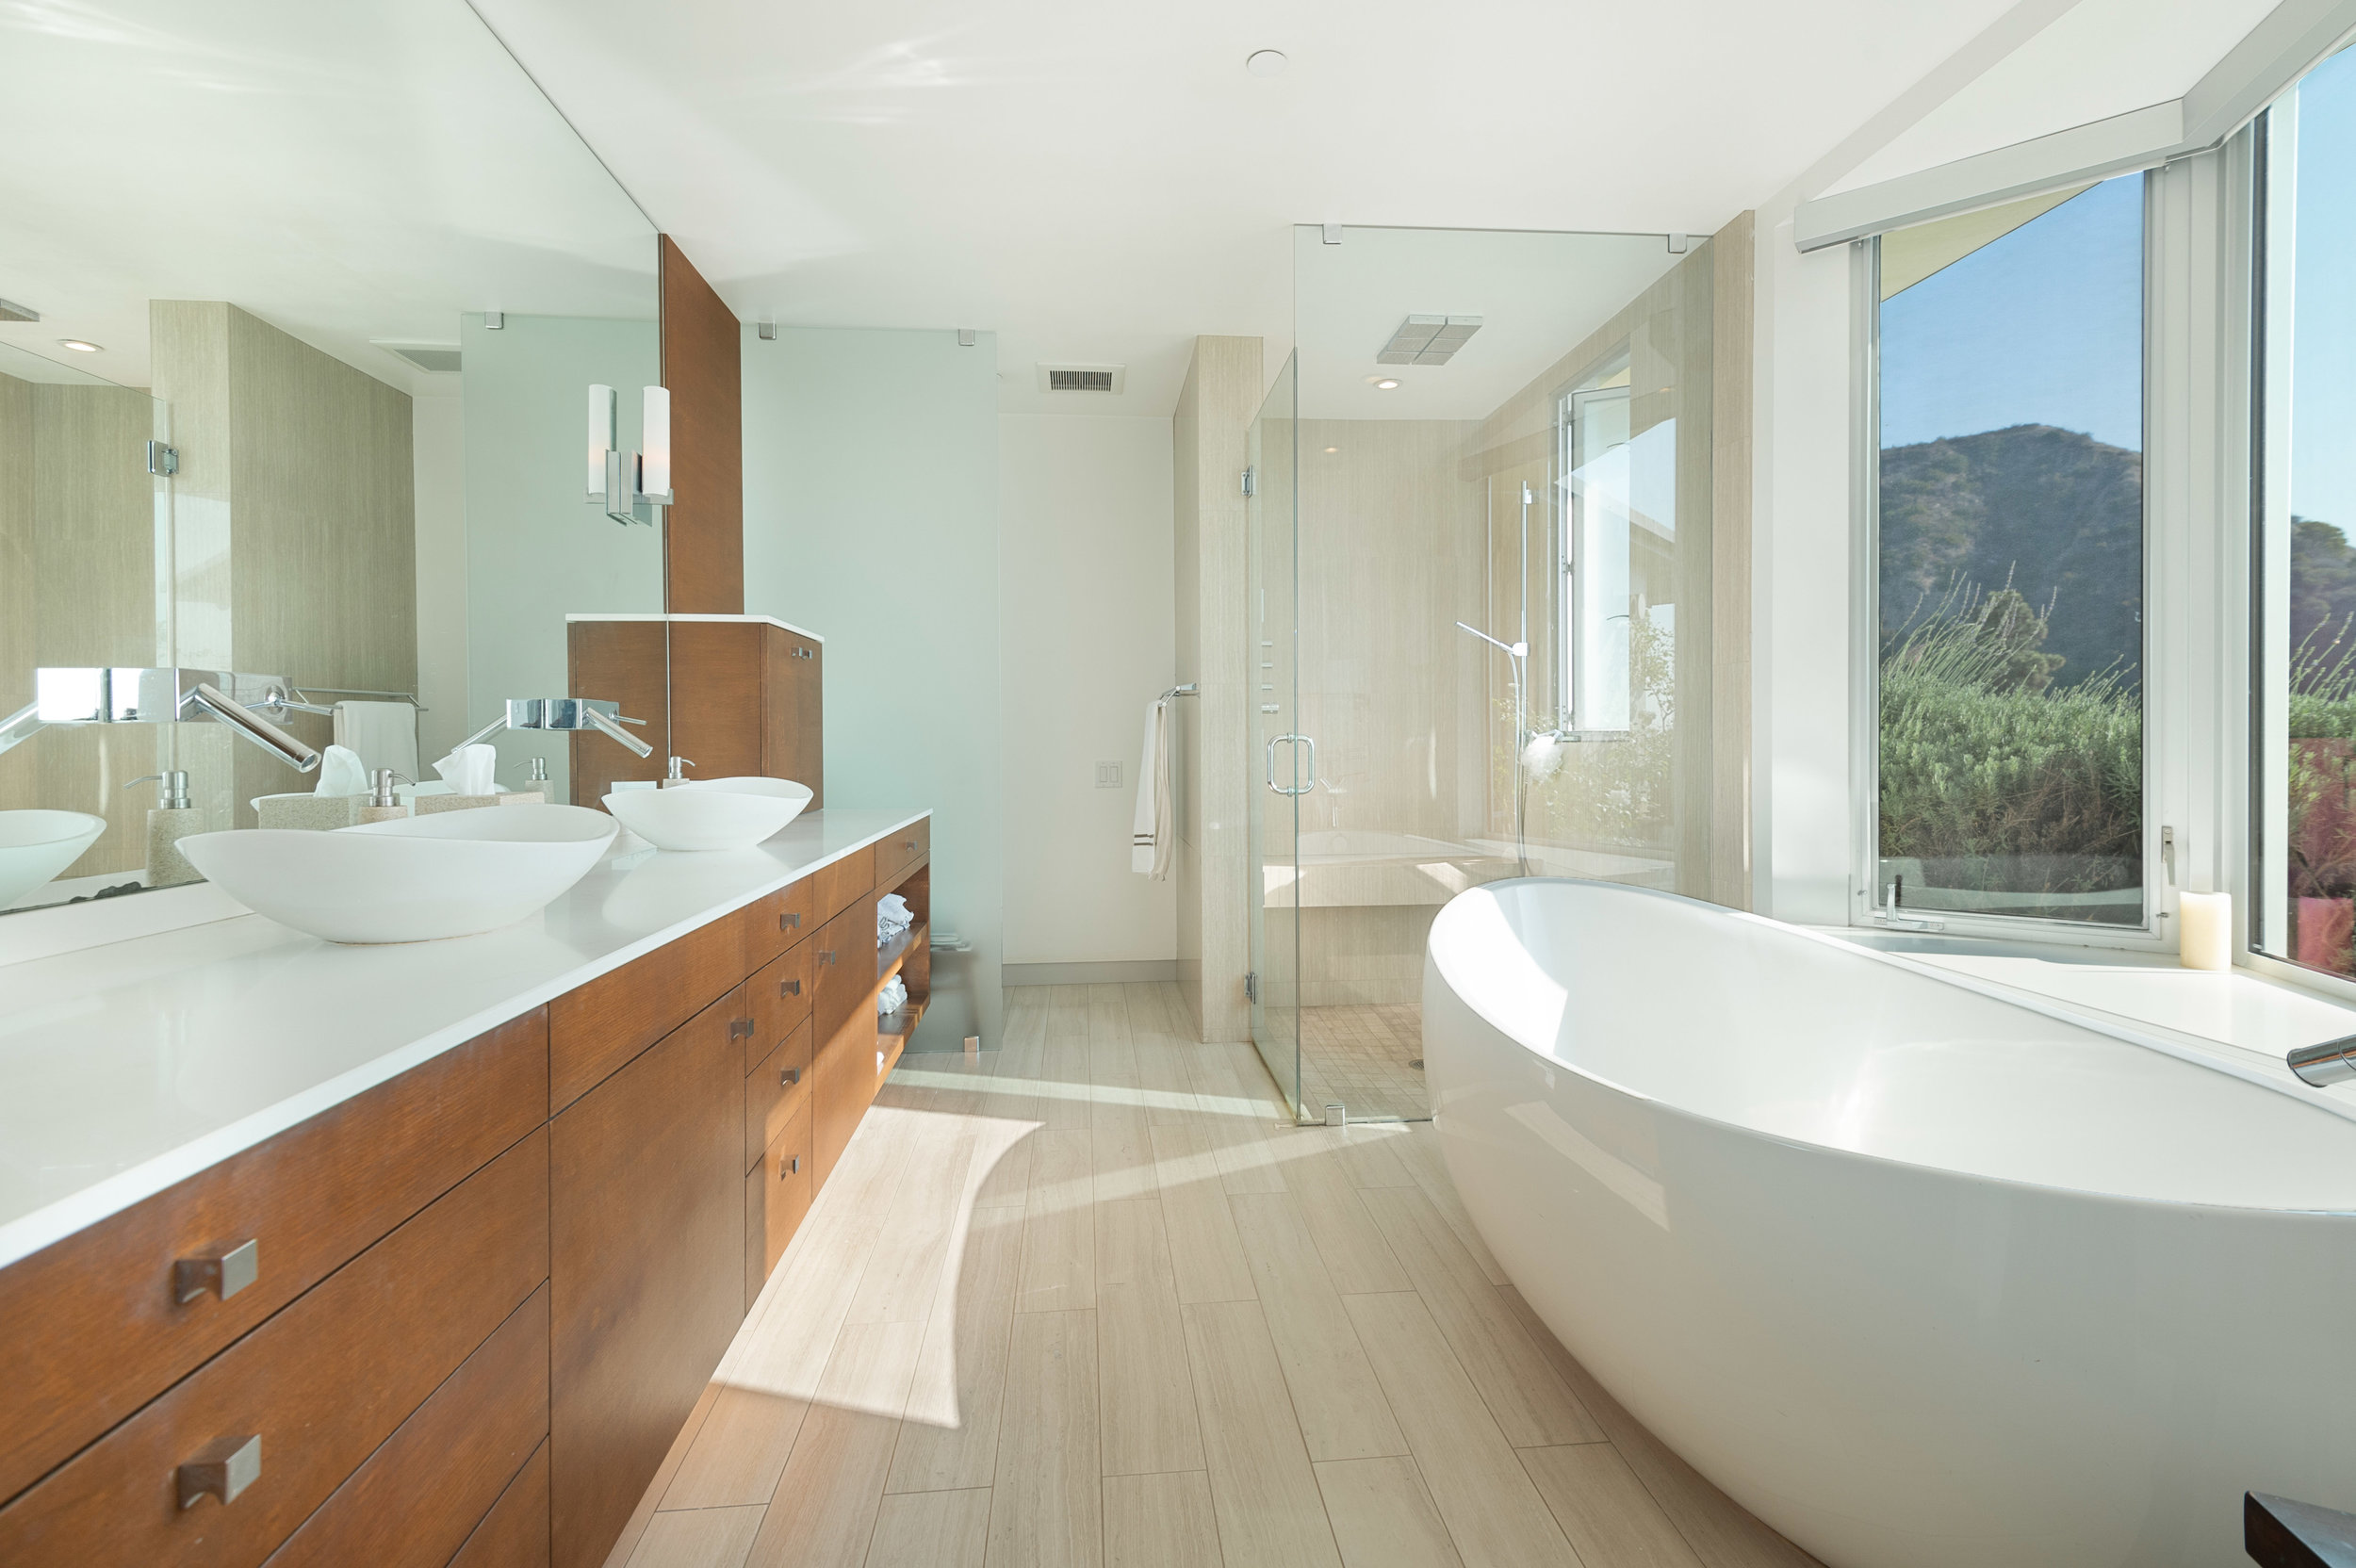 Copy of 011.1 Bathroom 20729 Eaglepass For Sale Lease The Malibu Life Team Luxury Real Estate.jpg